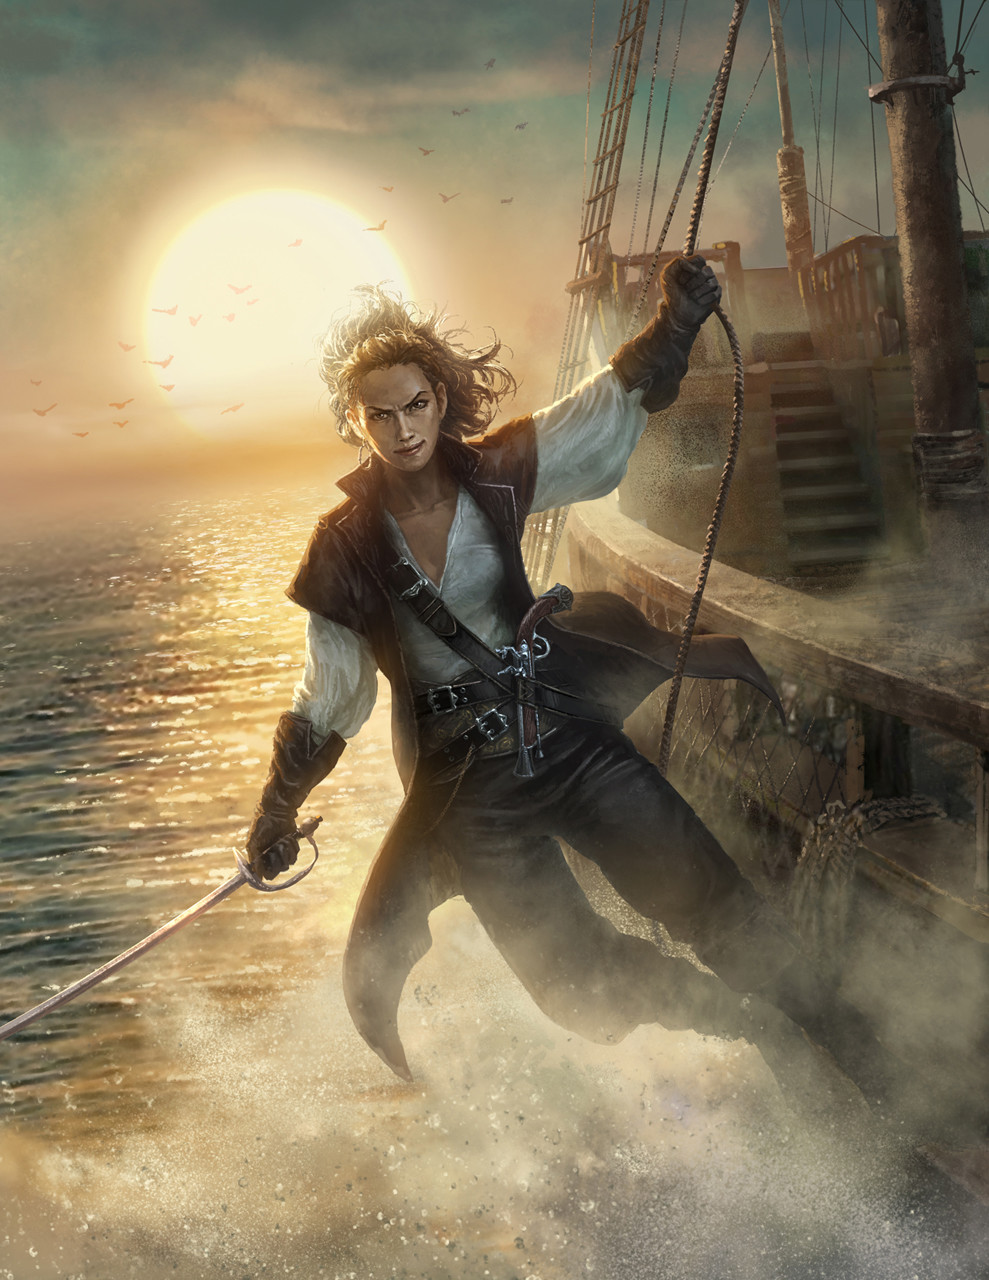 картинка храбрый пират бороться